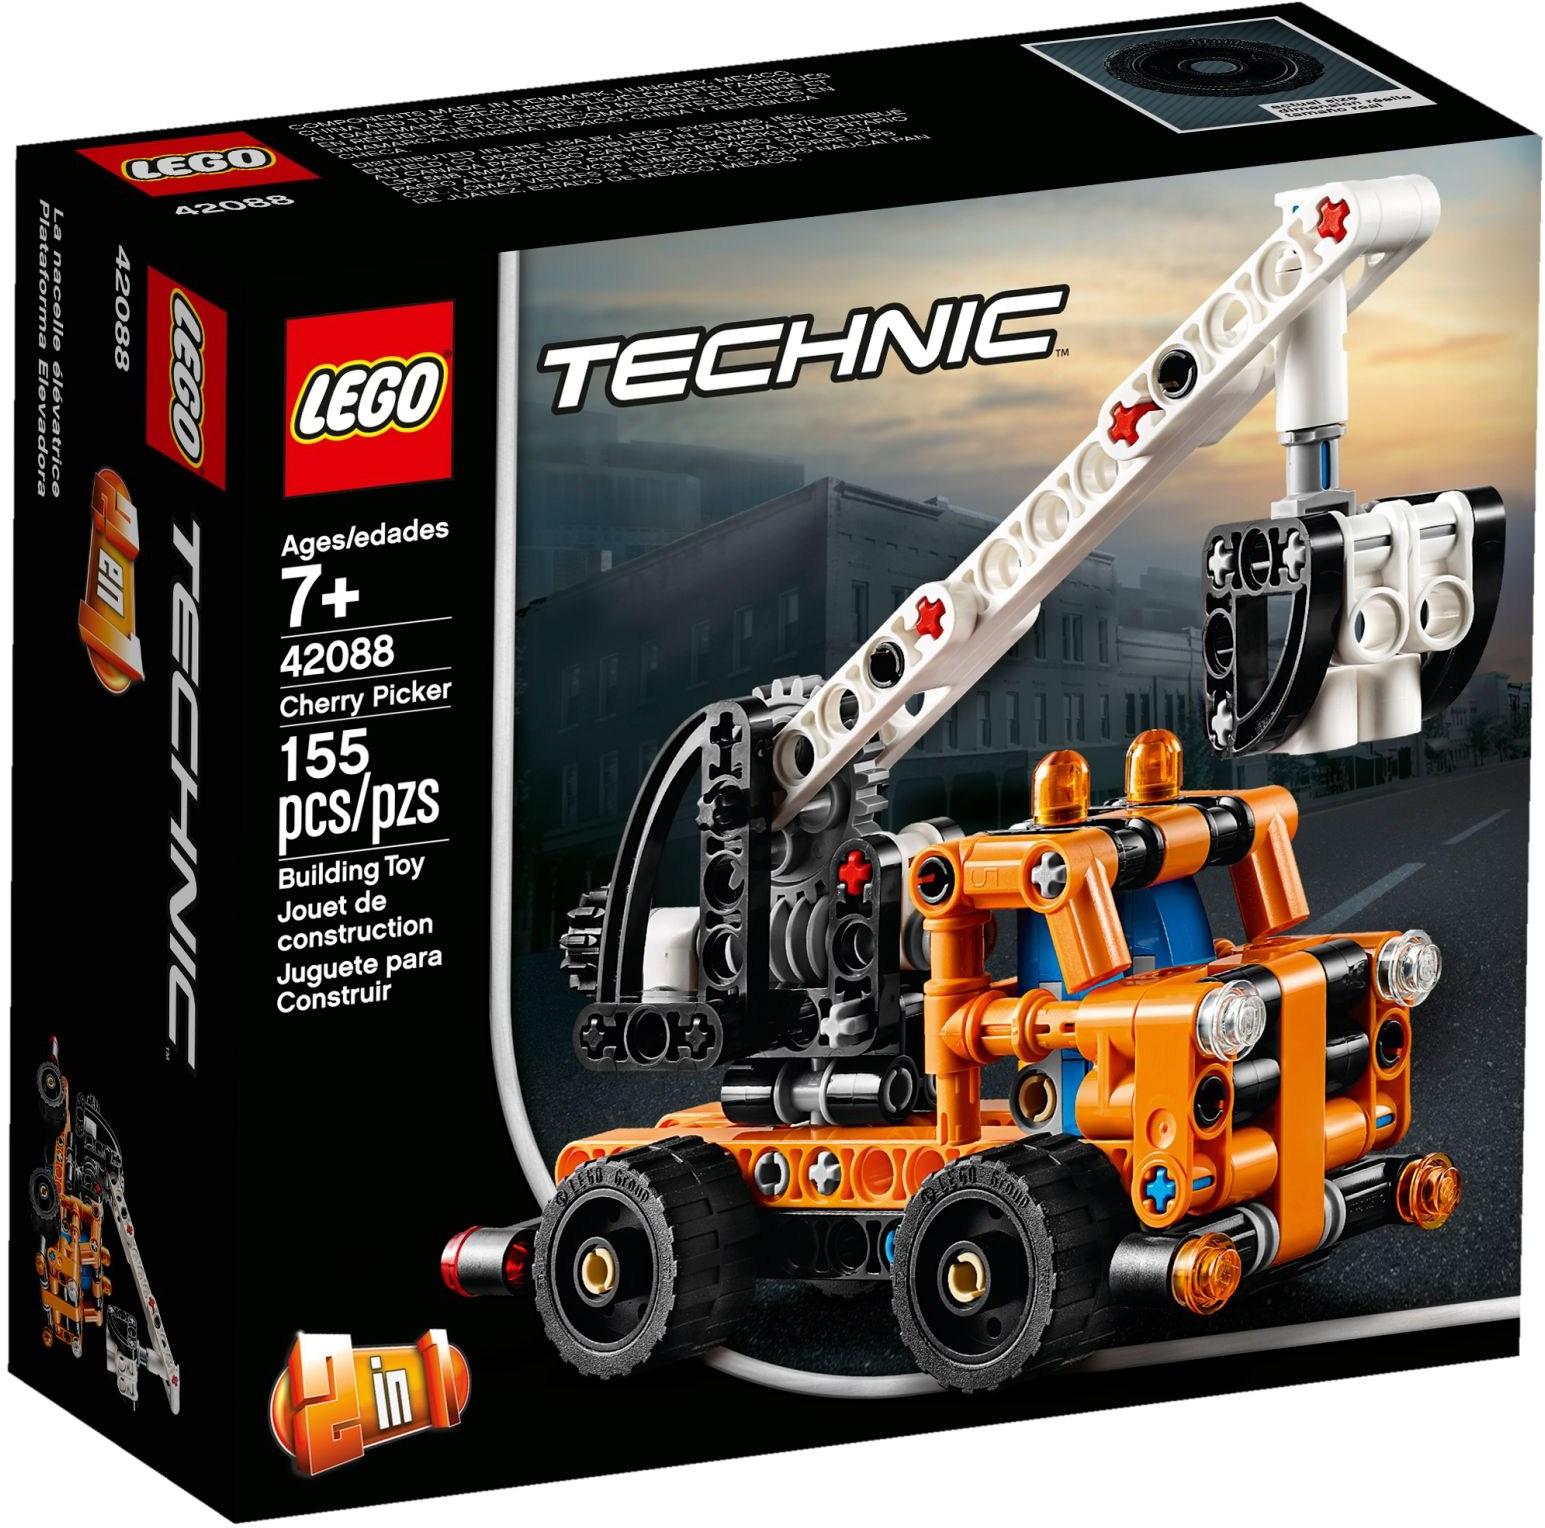 LEGO CHERRY PICKER - 42088